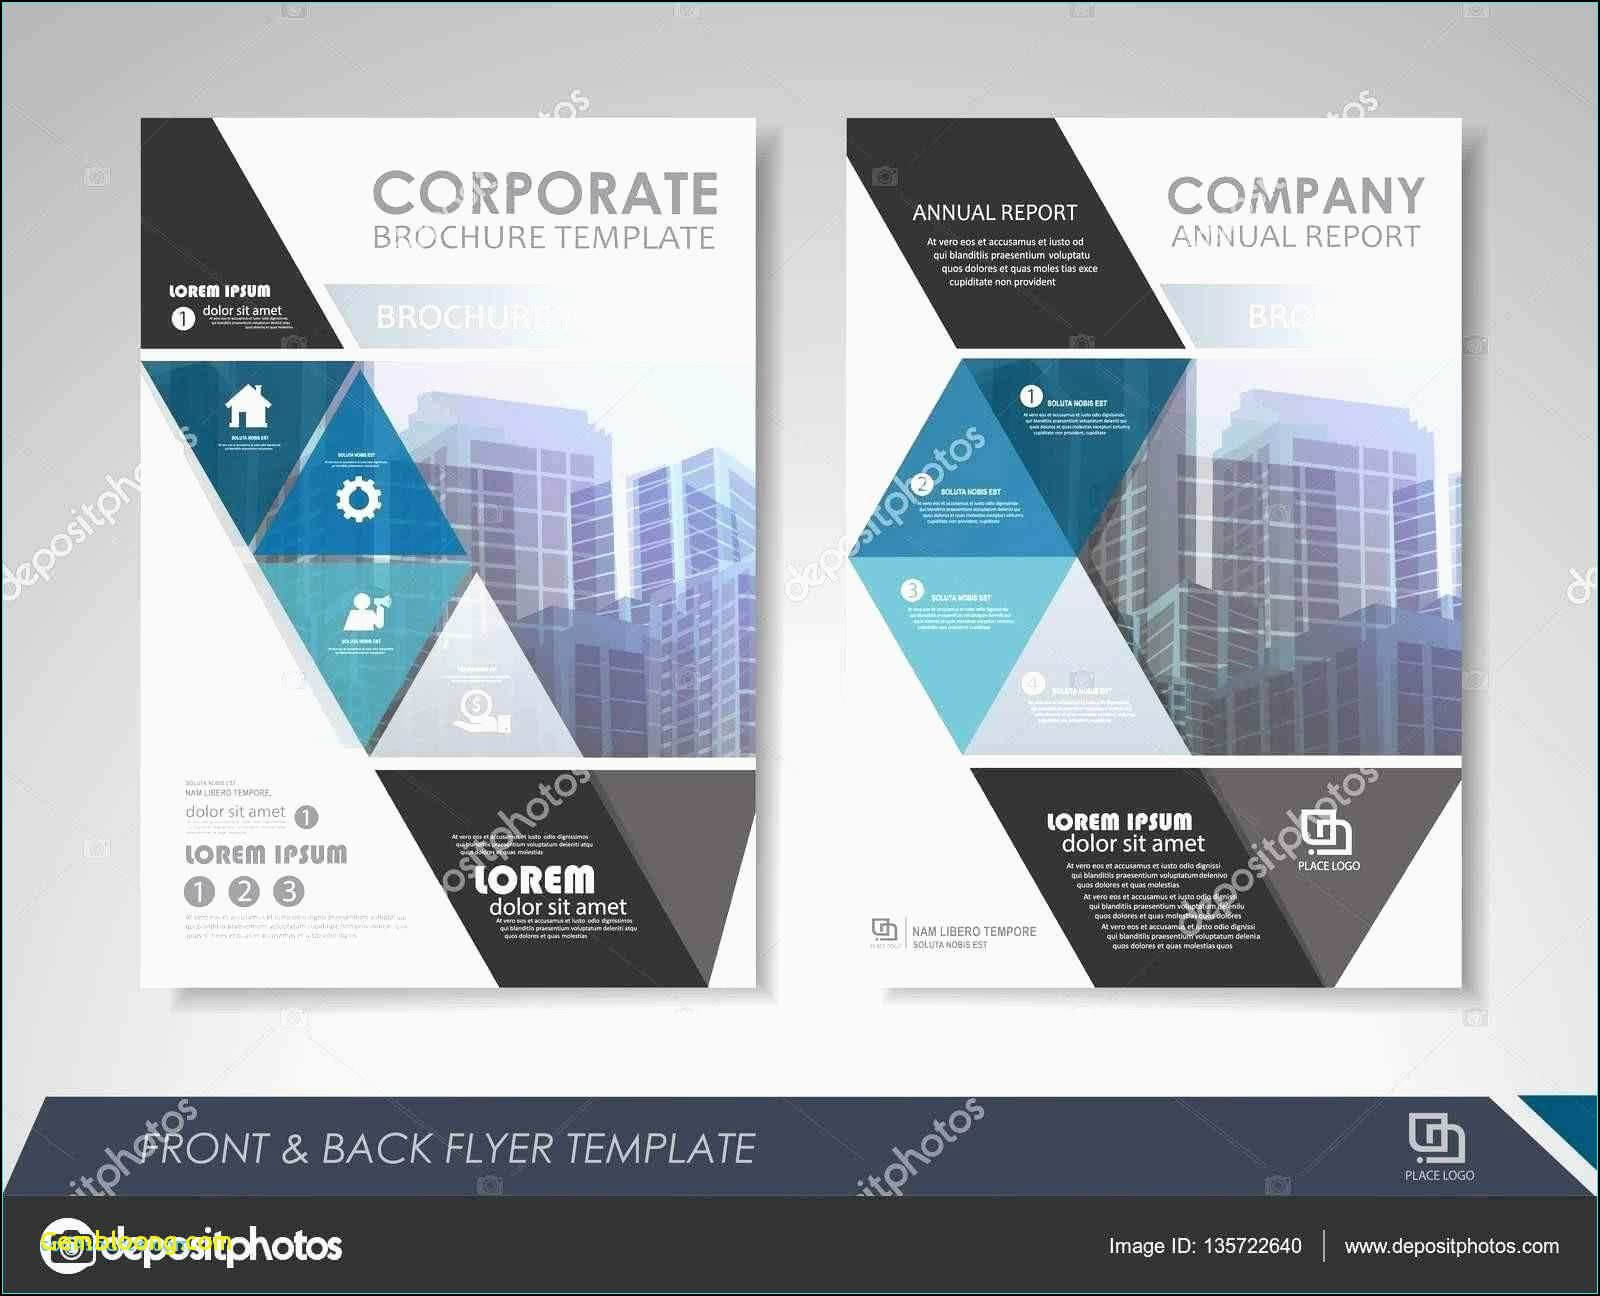 Unique 28 A4 Tri Fold Brochure Template Psd Free Download With Regard To 3 Fold Brochure Template Free Download